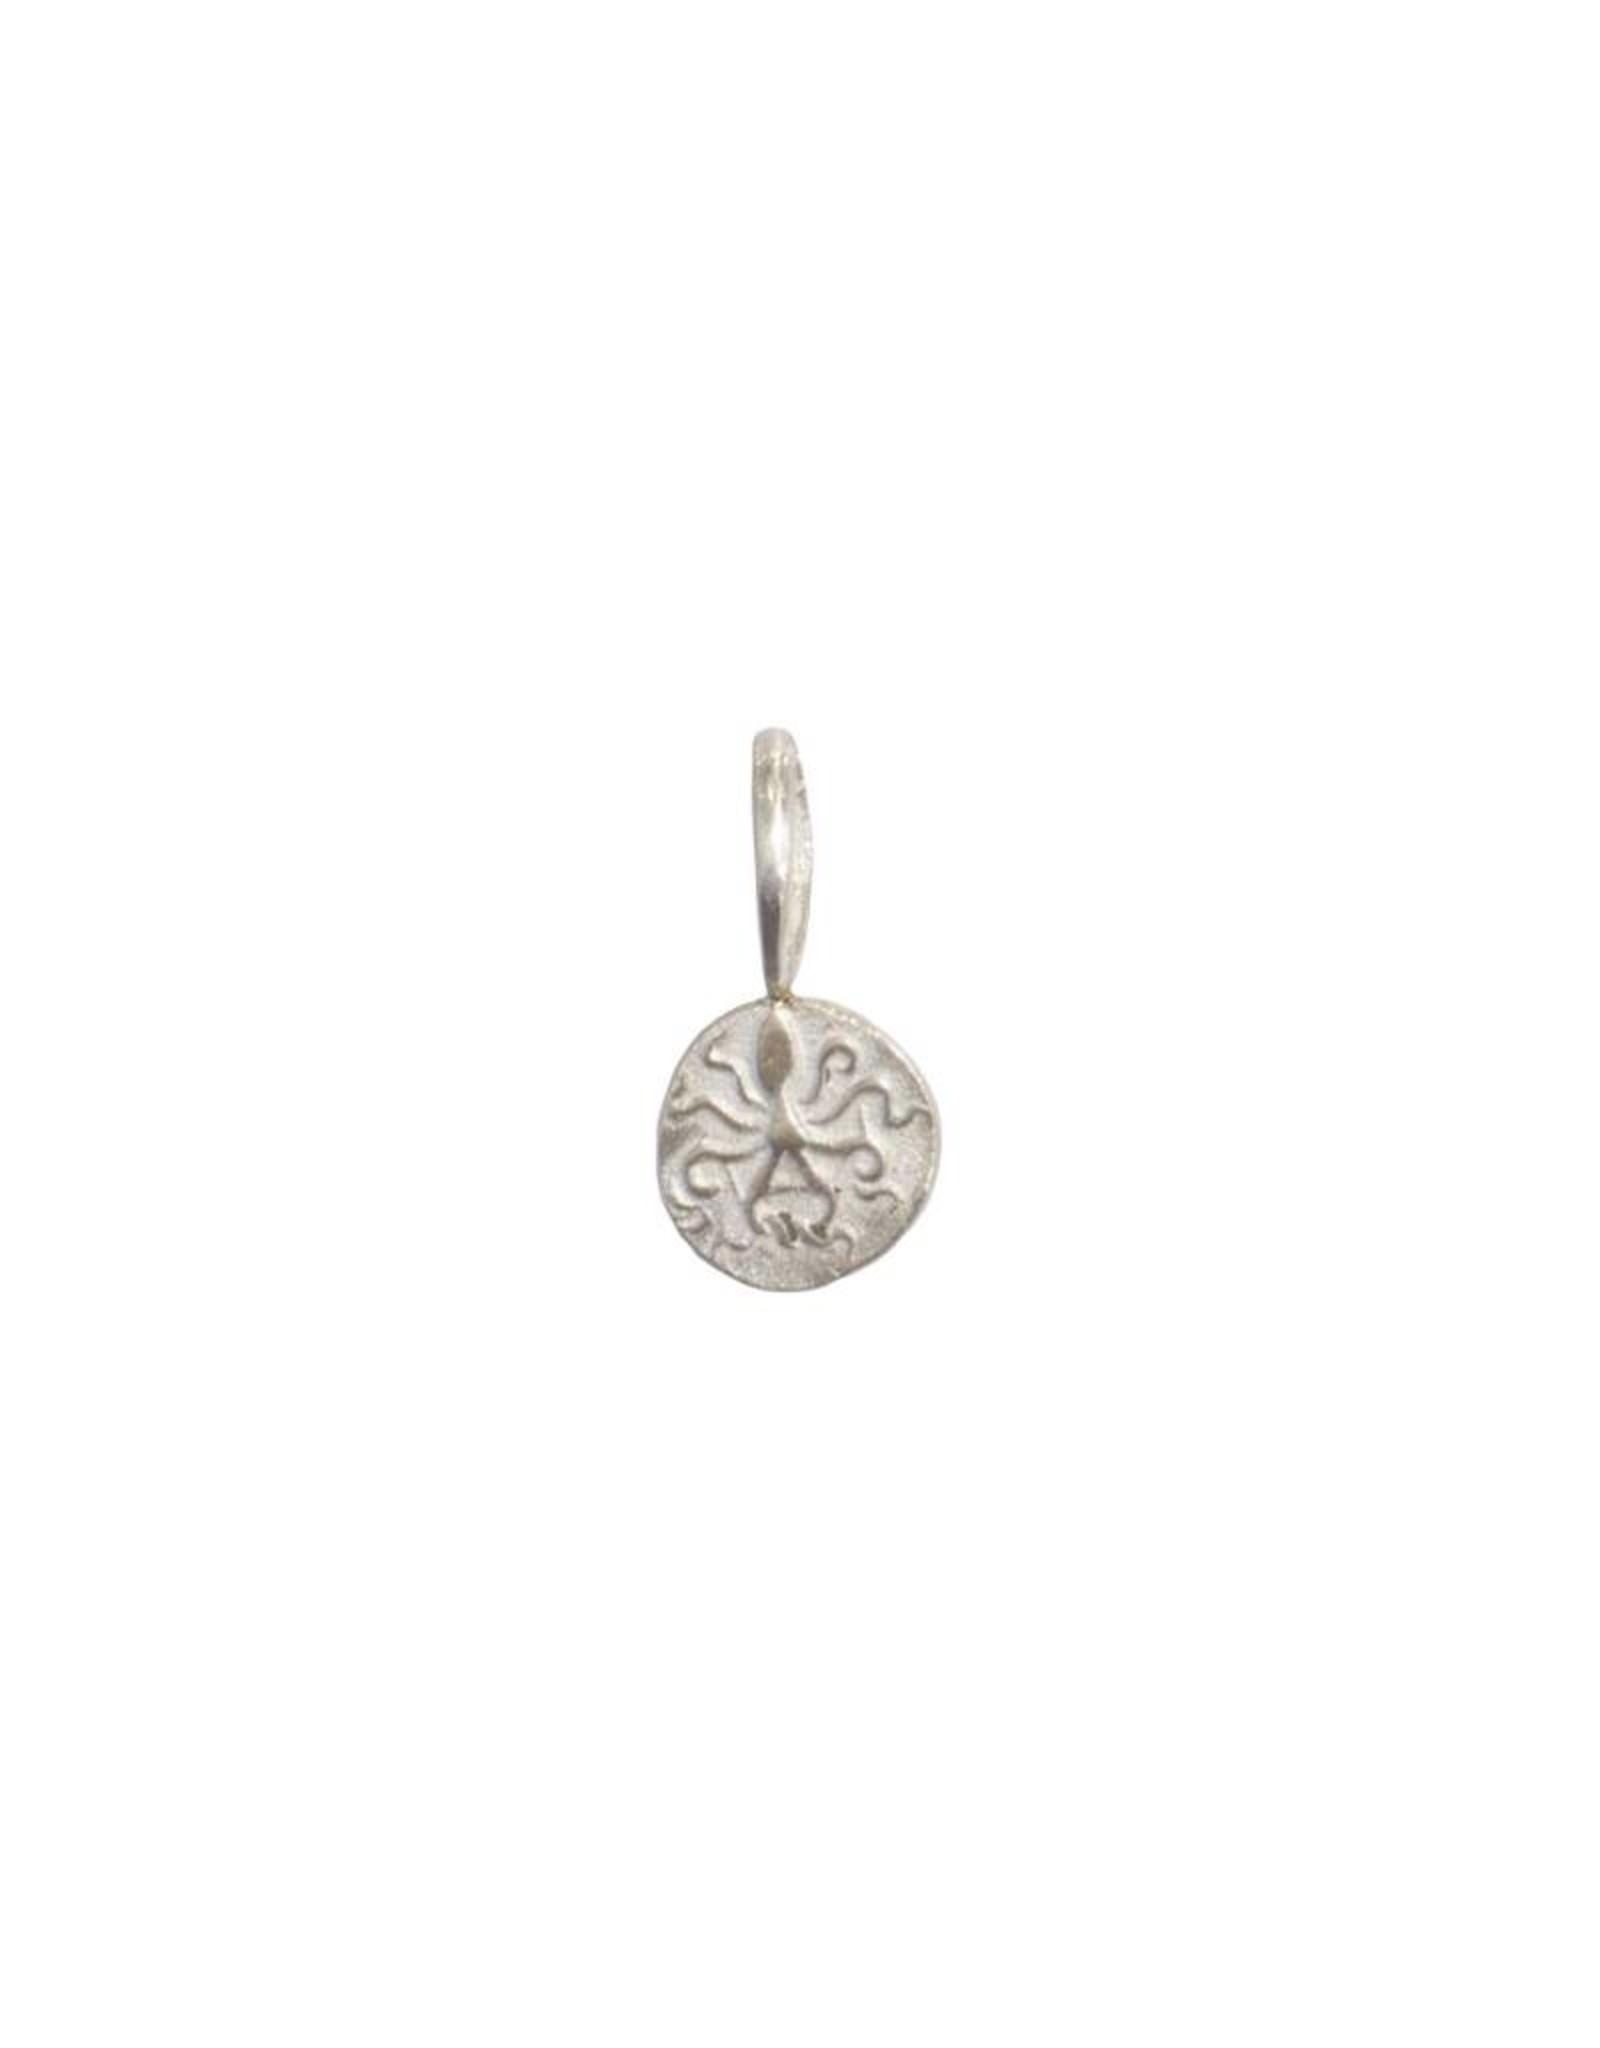 Robin Haley Jewelry Octopus (Balance)   Motherhood Artifact Necklace - Double-Sided